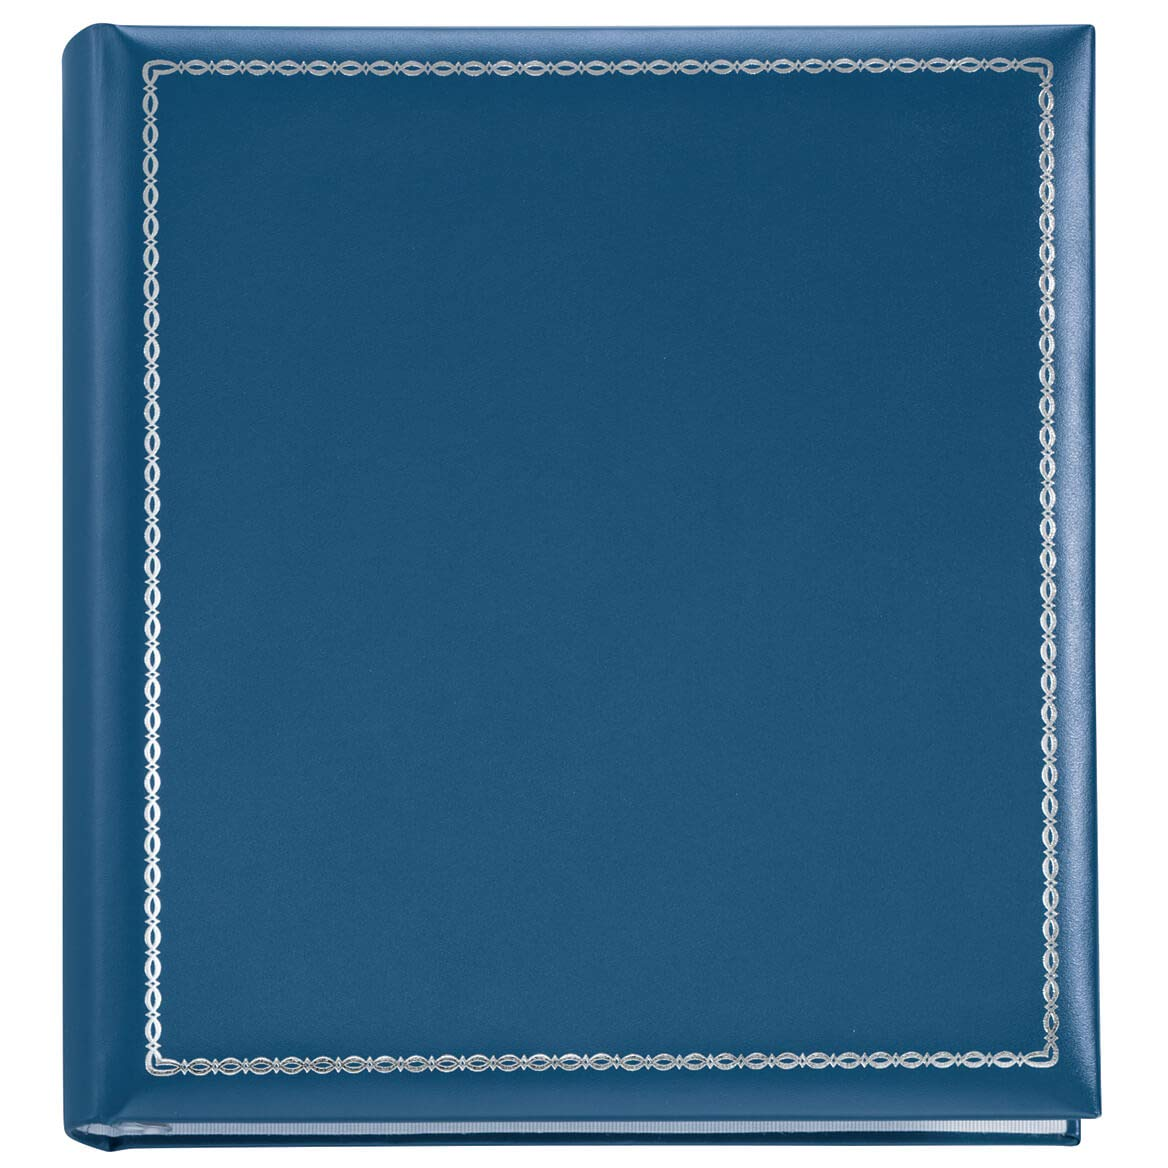 Exposures Felicity 3-Ring Photo Album Gift Set, Blue